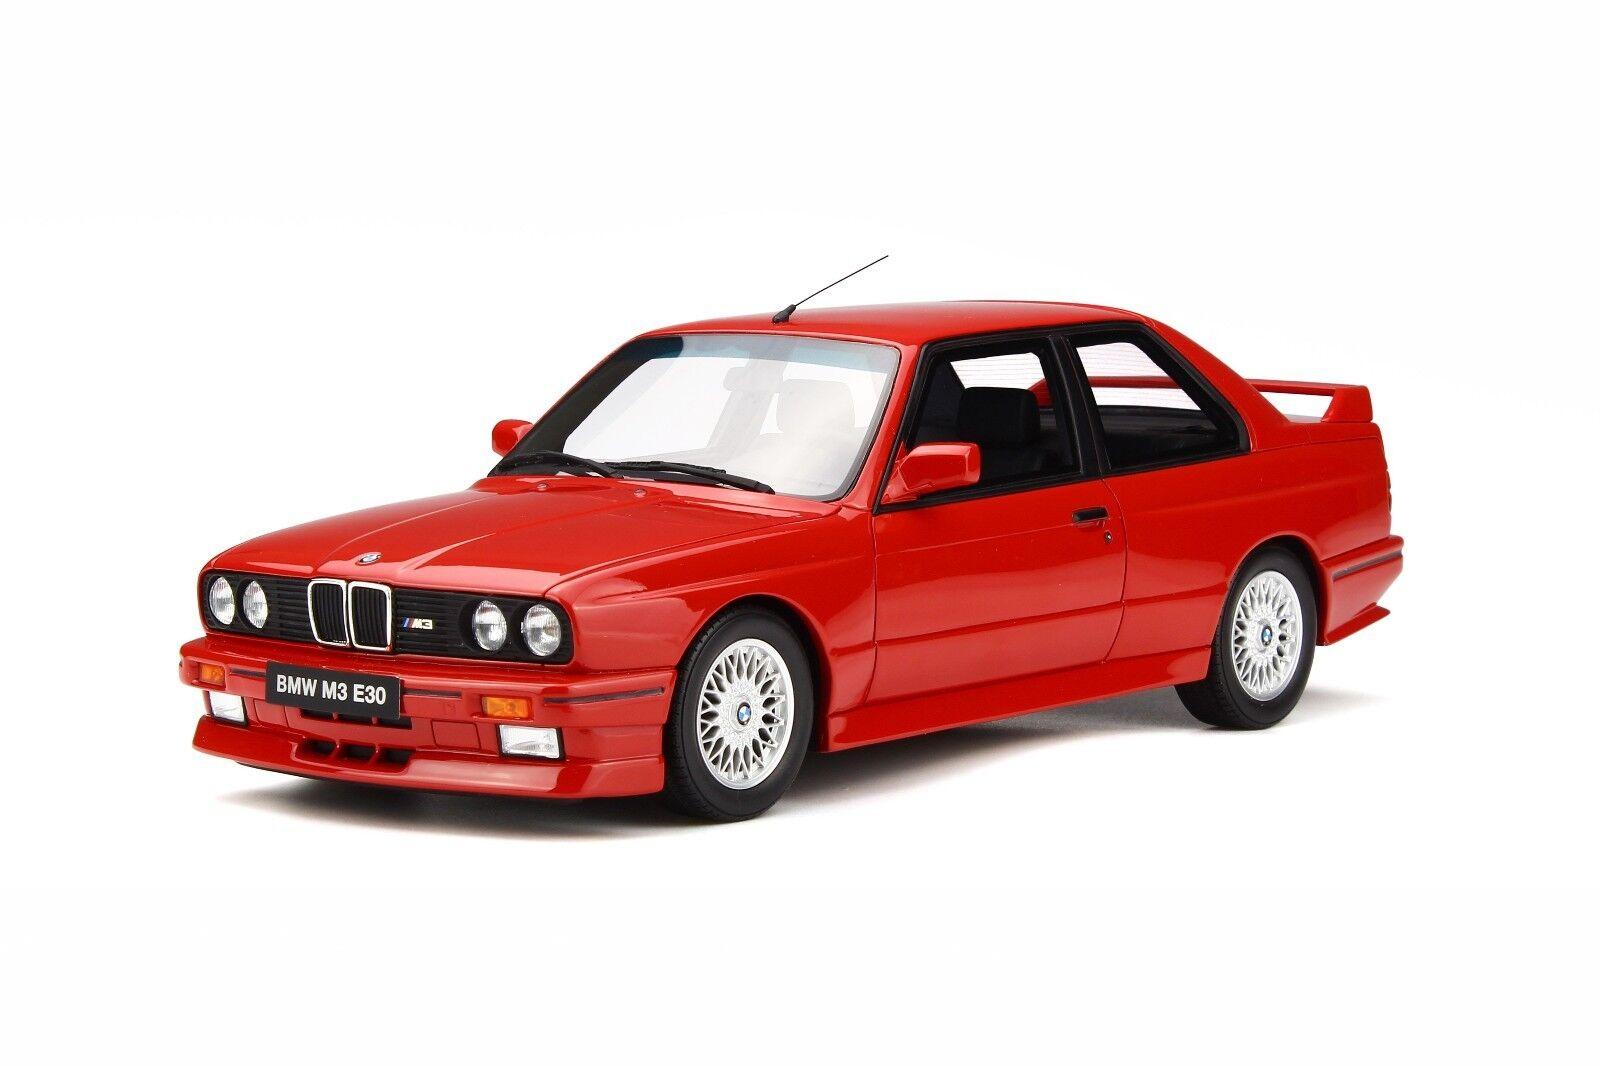 BMW m3 e30  NOUVEAU  Otto ot695  1 18